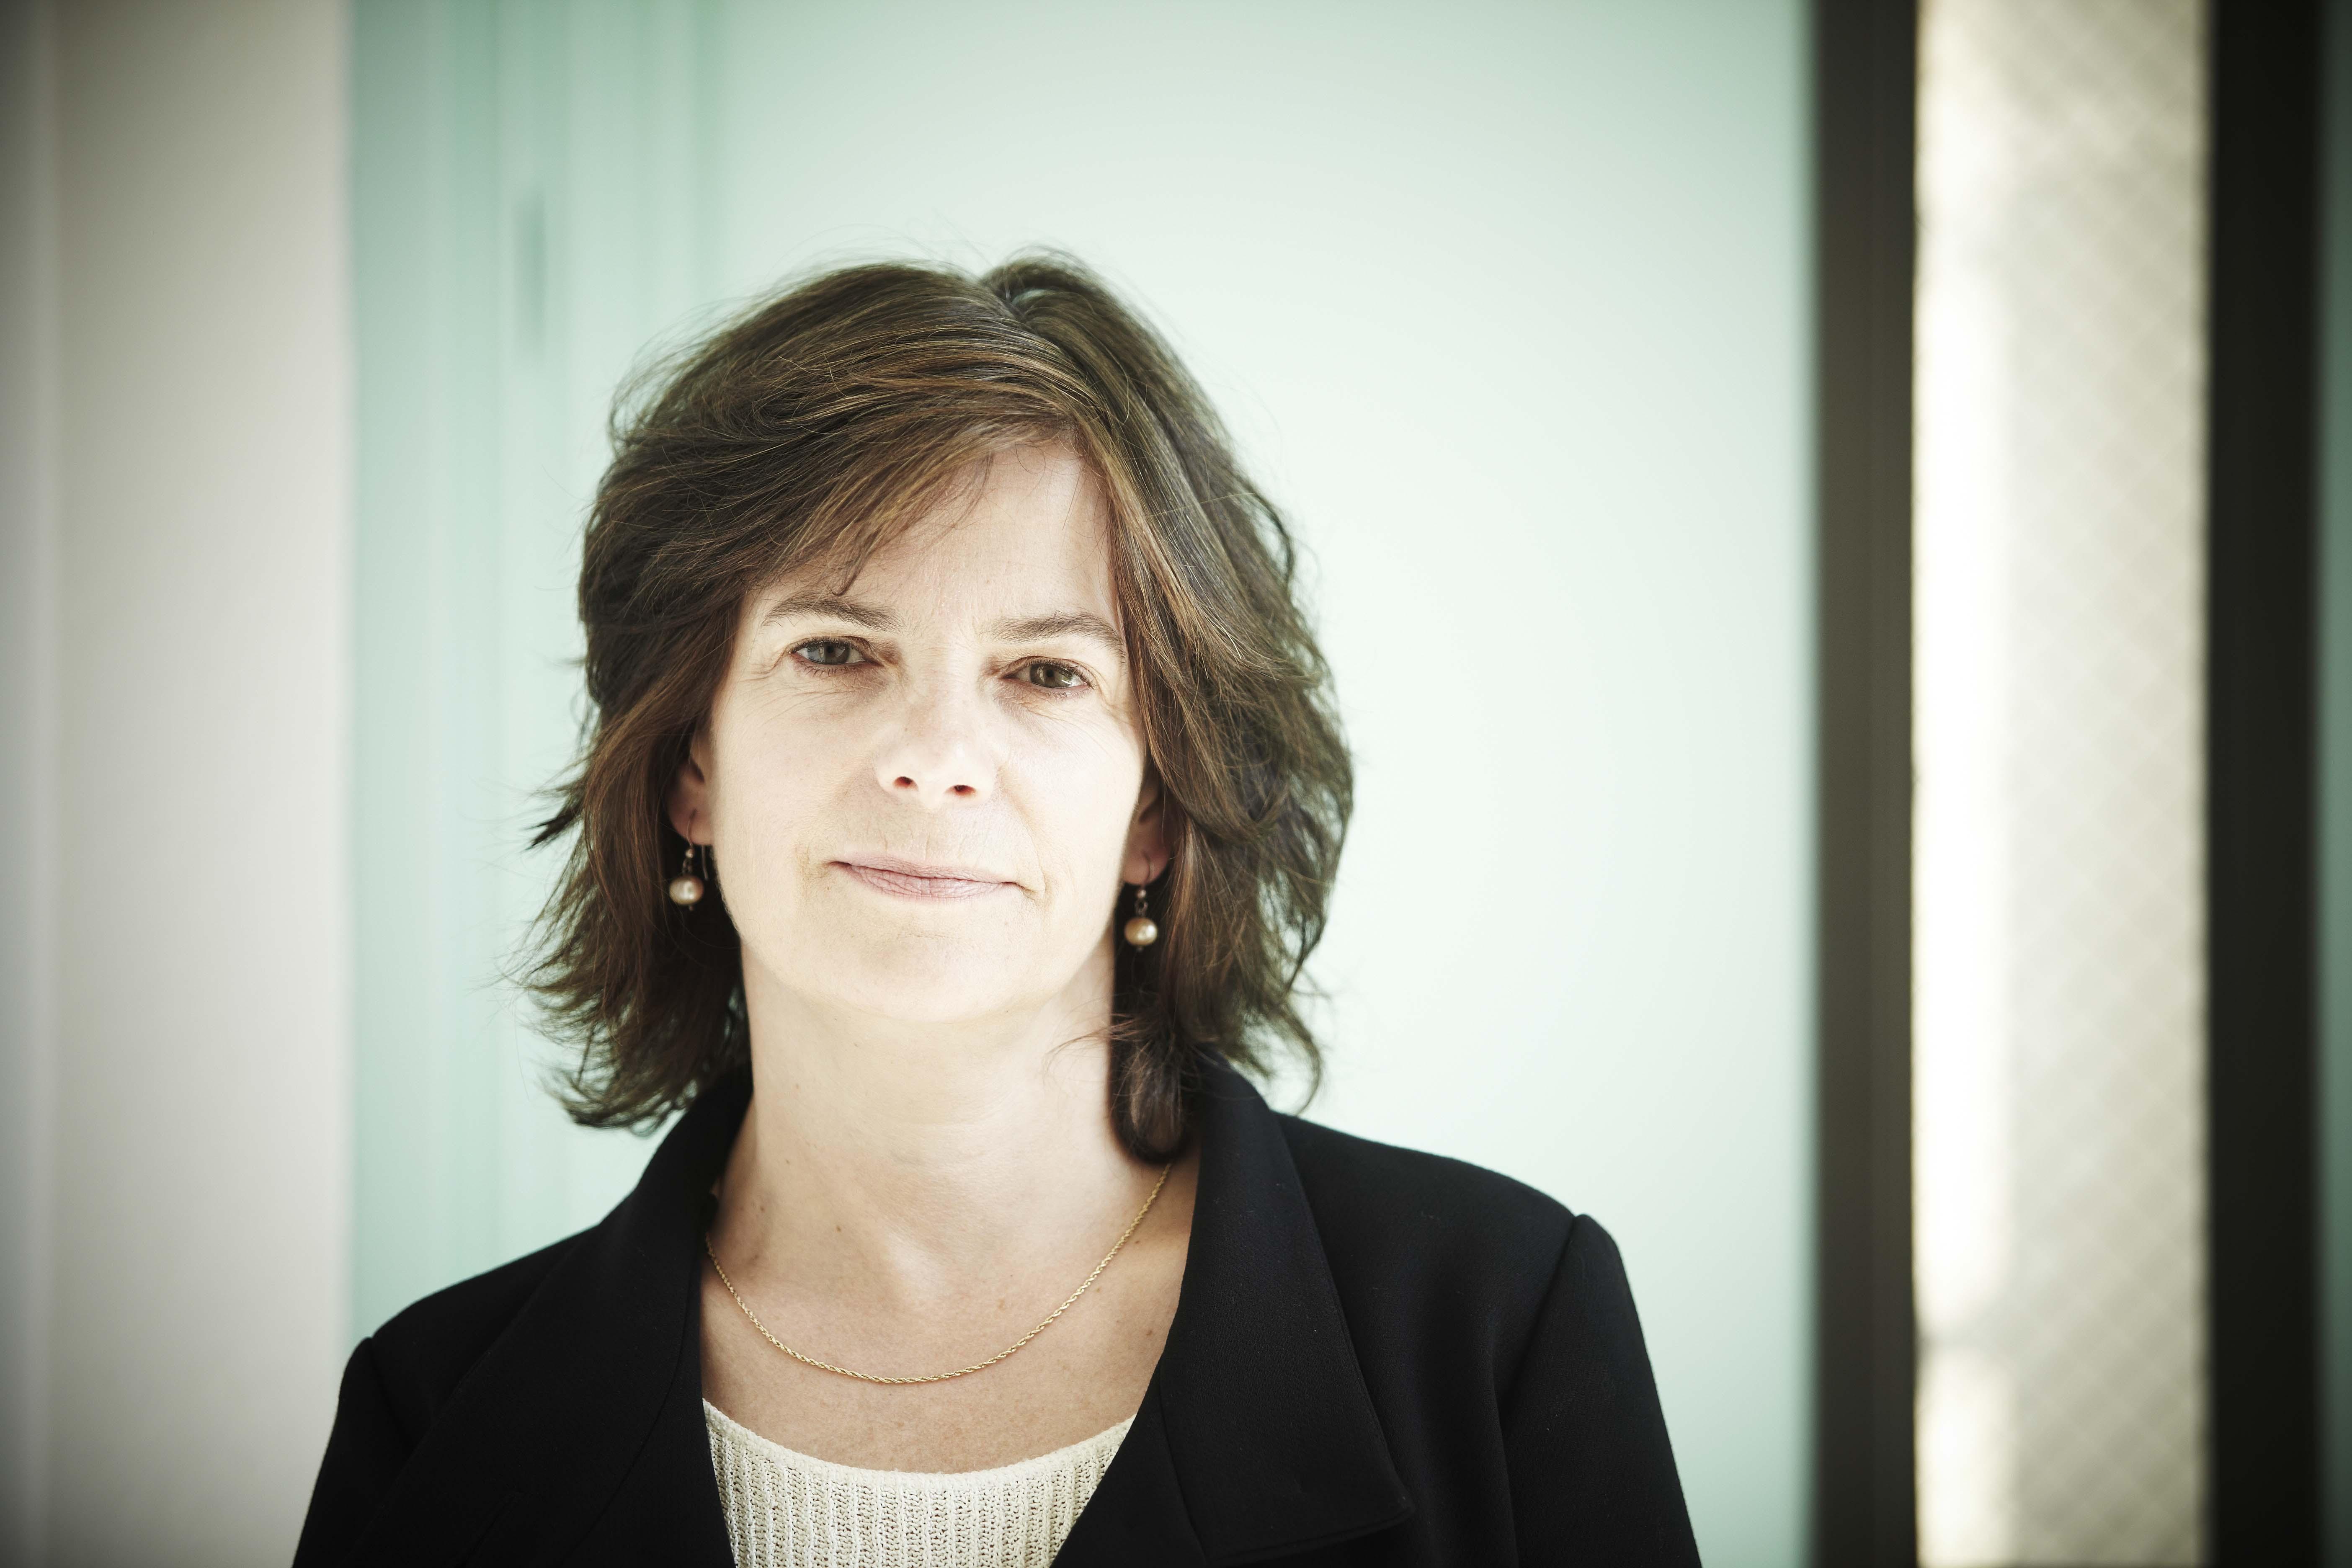 image of Kristine Yaffe